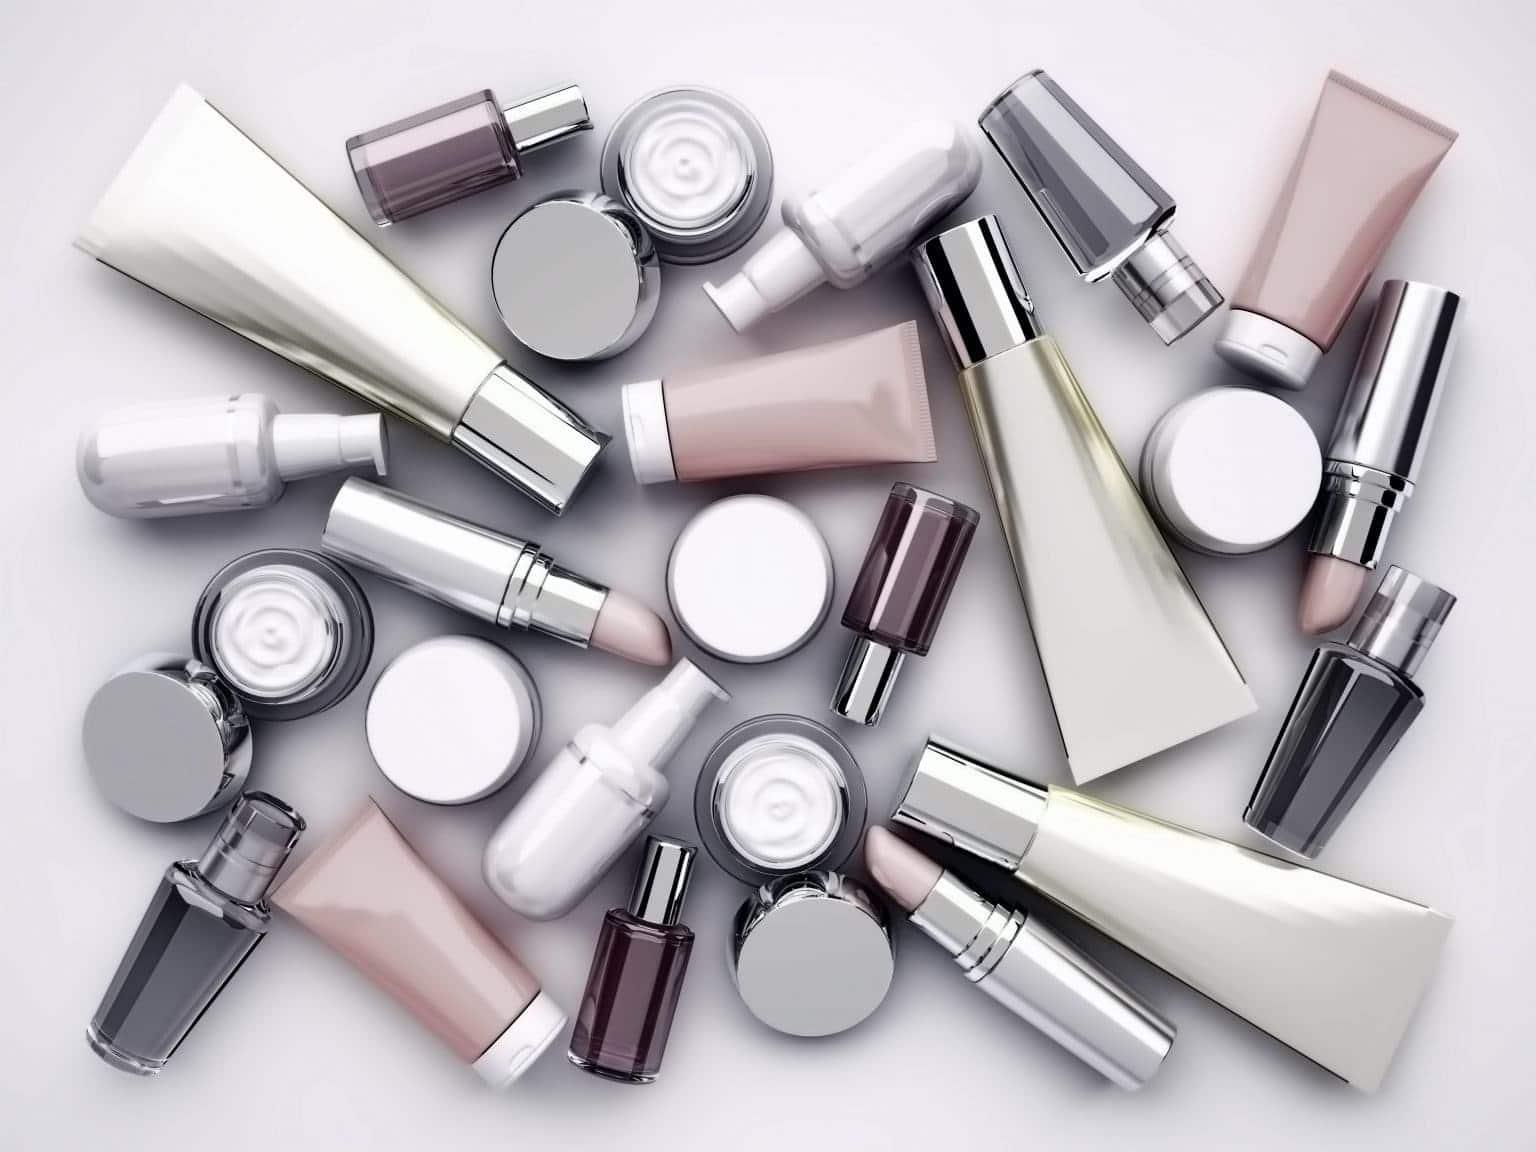 Aluminum in cosmetics / deodorants / dermal products dangerous to health